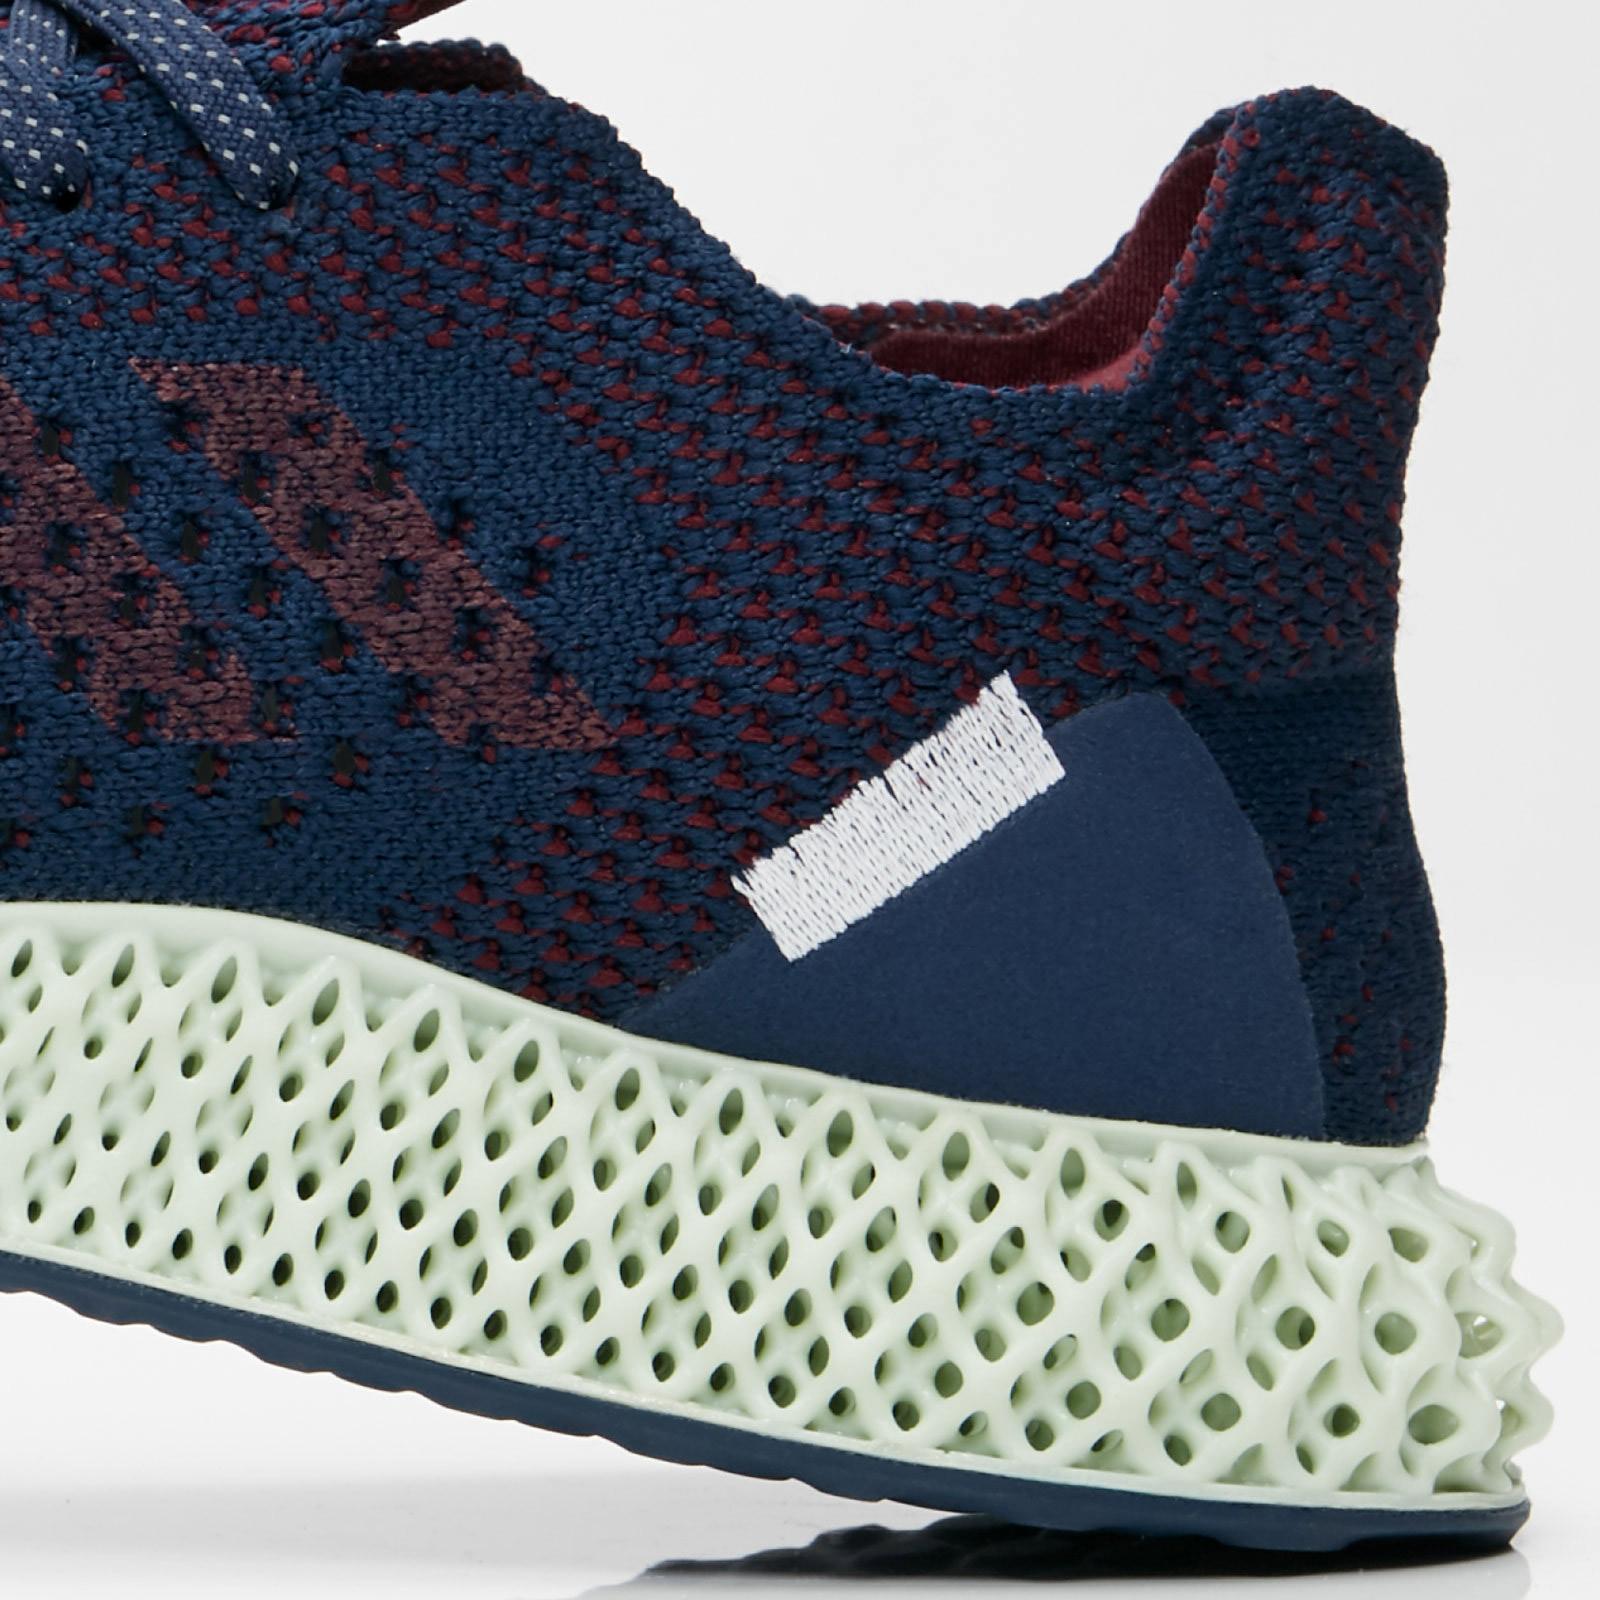 SNS Adidas Consortium-4D-6 - WearTesters